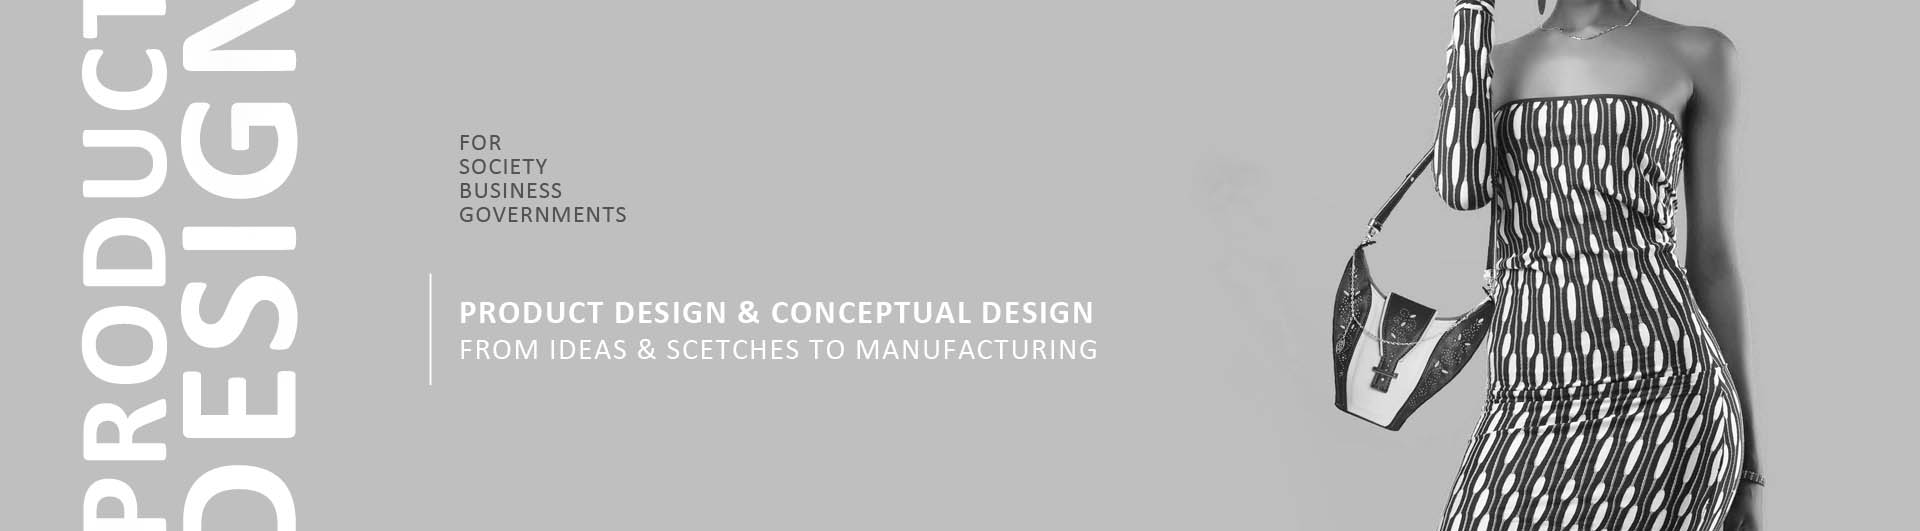 product design service qlare